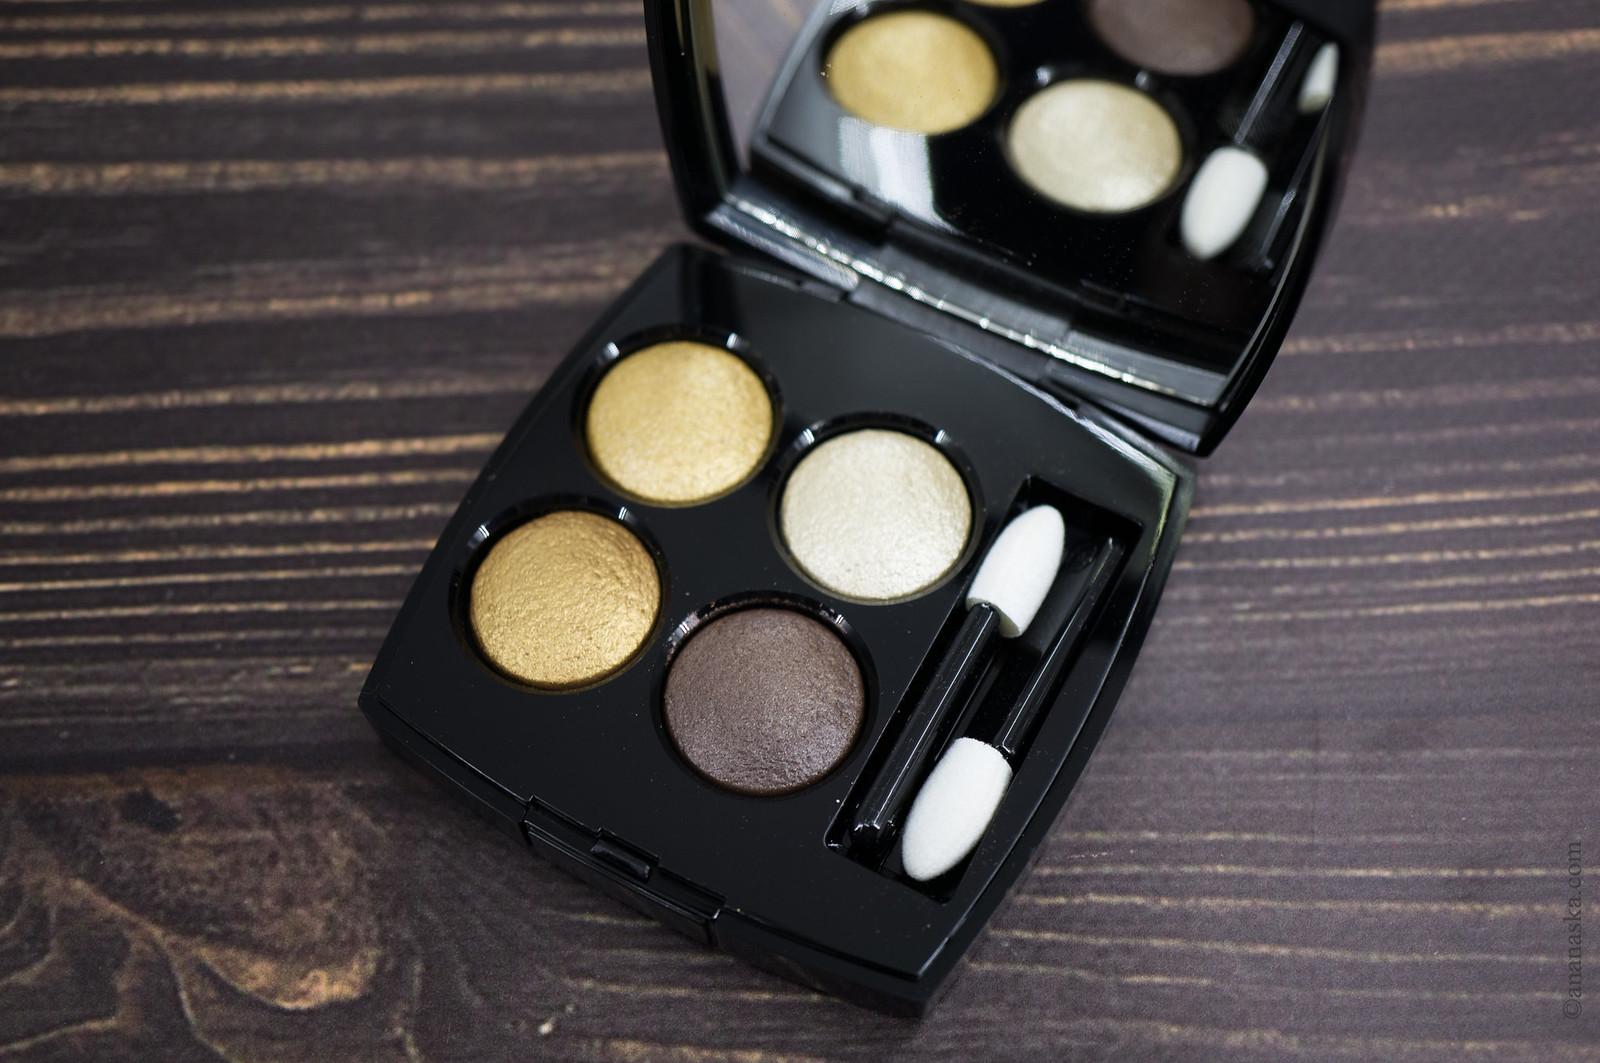 Chanel Les 4 Ombres 274 Codes Elegants